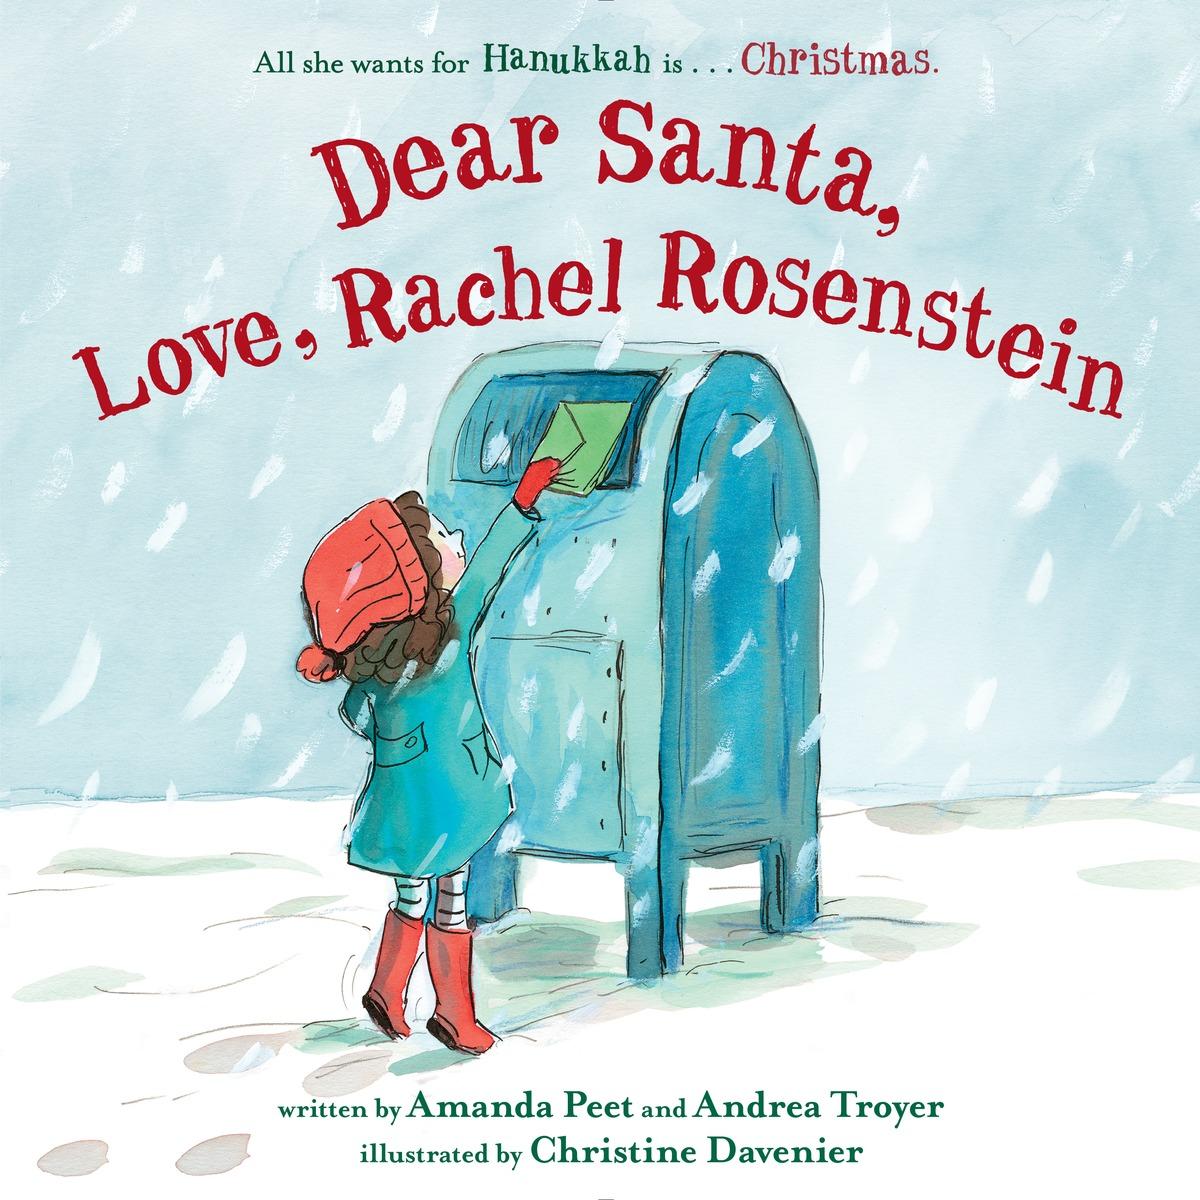 #RachelRosenstein #XmasEnvy #Holidays #Giveaway #ad